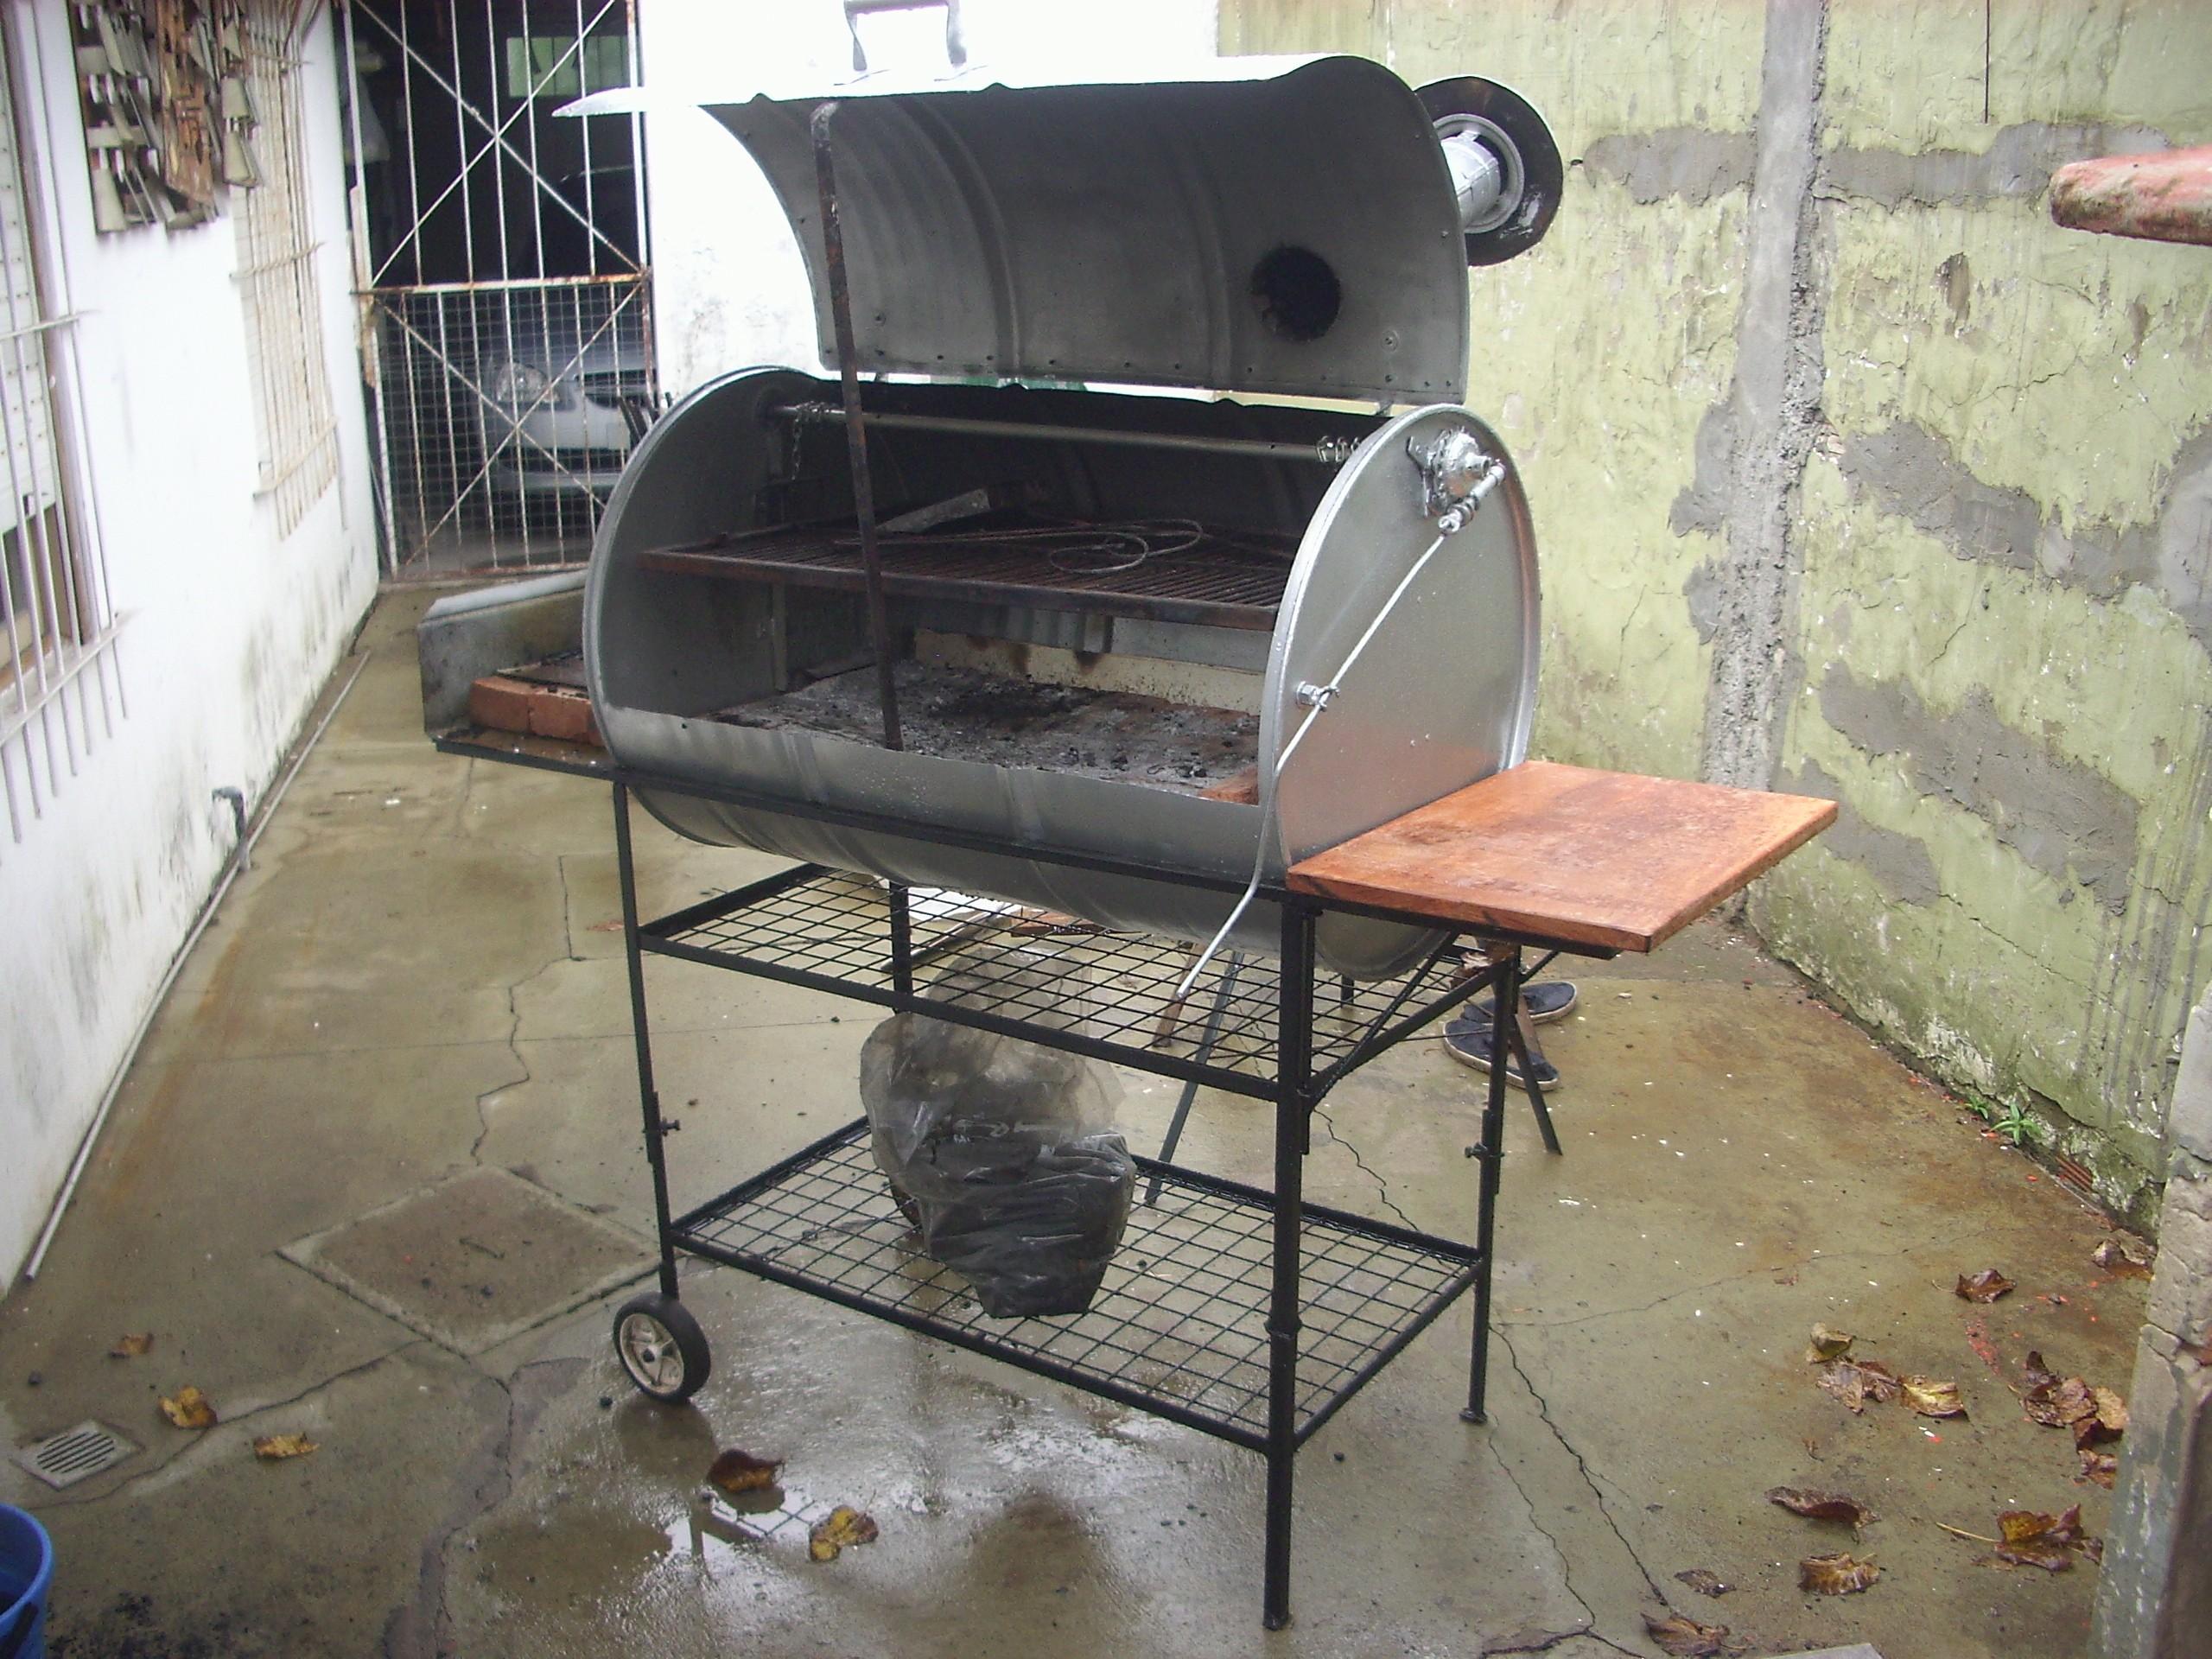 Picture of Chulengo (sudaca's BBQ)